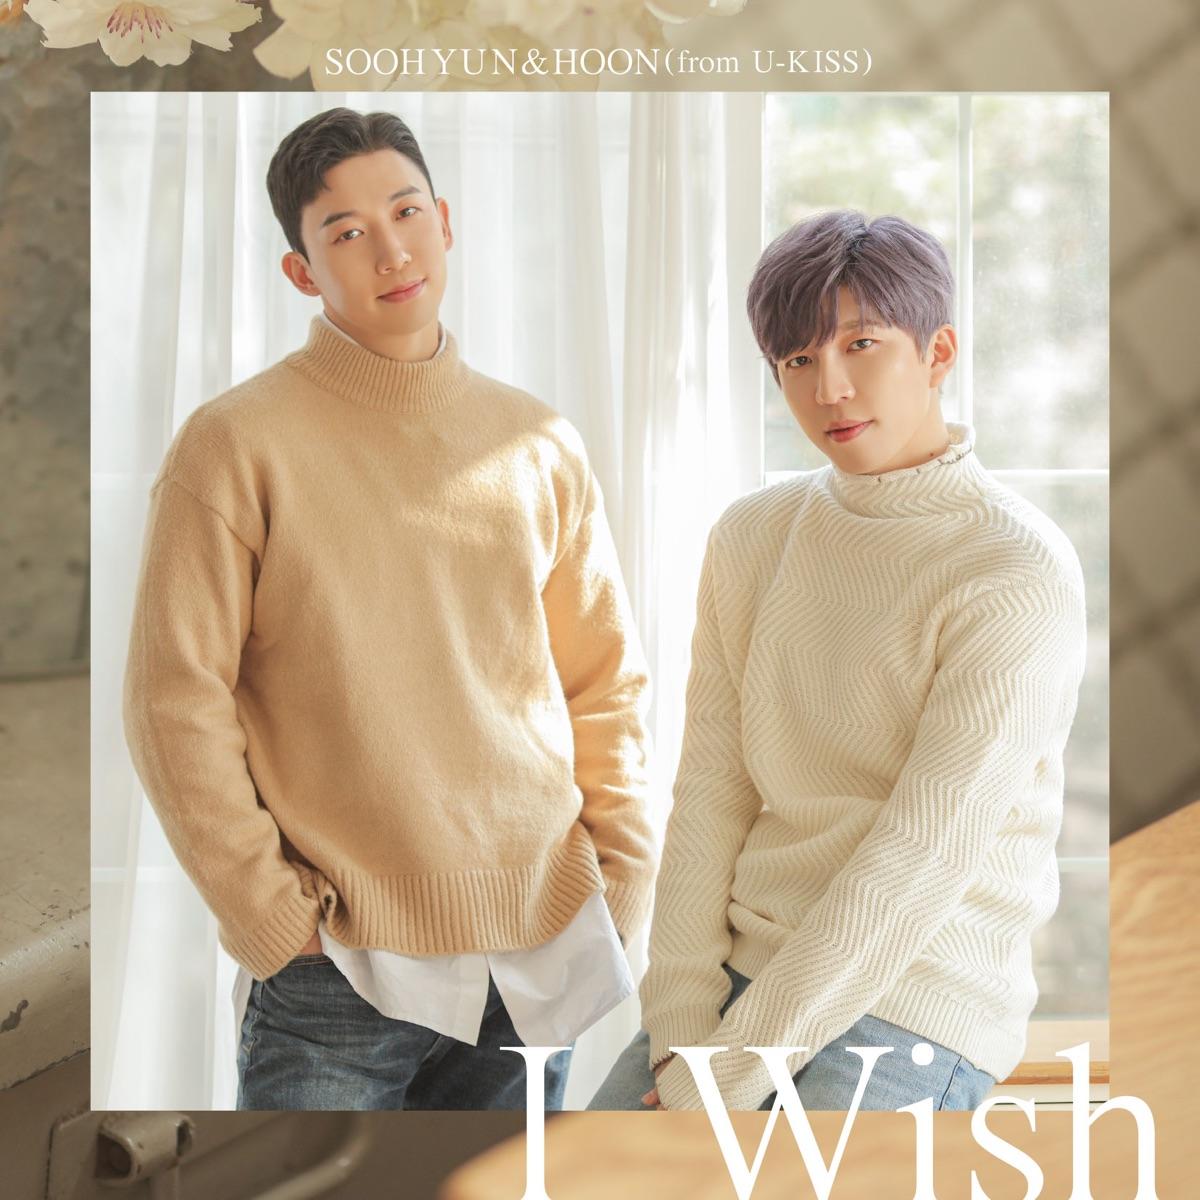 『SOOHYUN&HOON(from U-KISS) - I Wish・・・Japanese Version 歌詞』収録の『I Wish』ジャケット